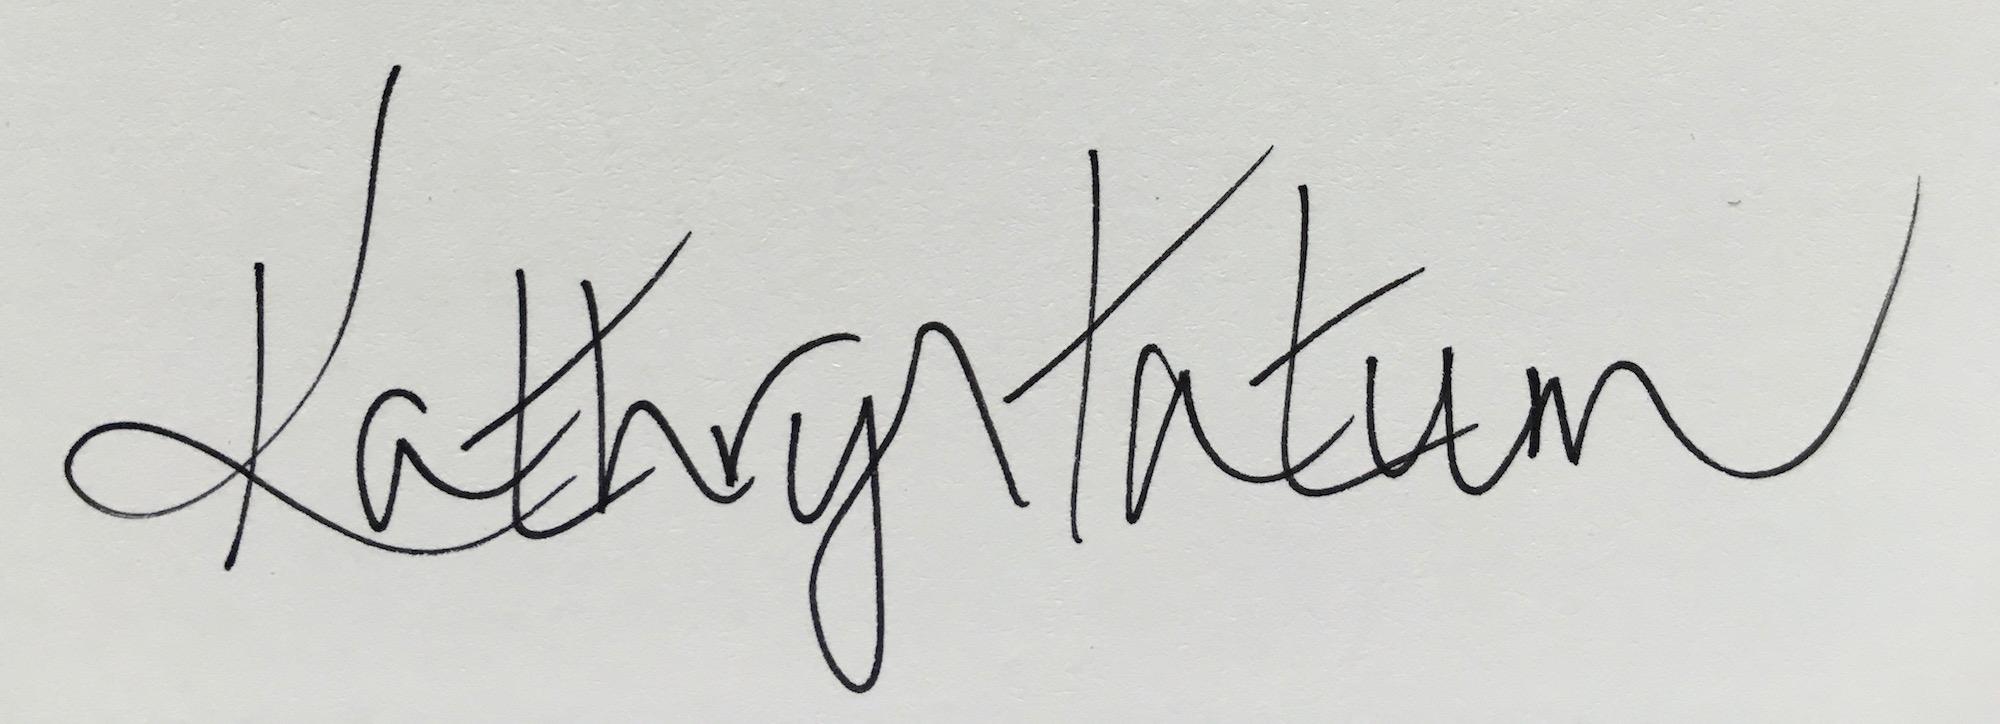 Kathryn Tatum's Signature